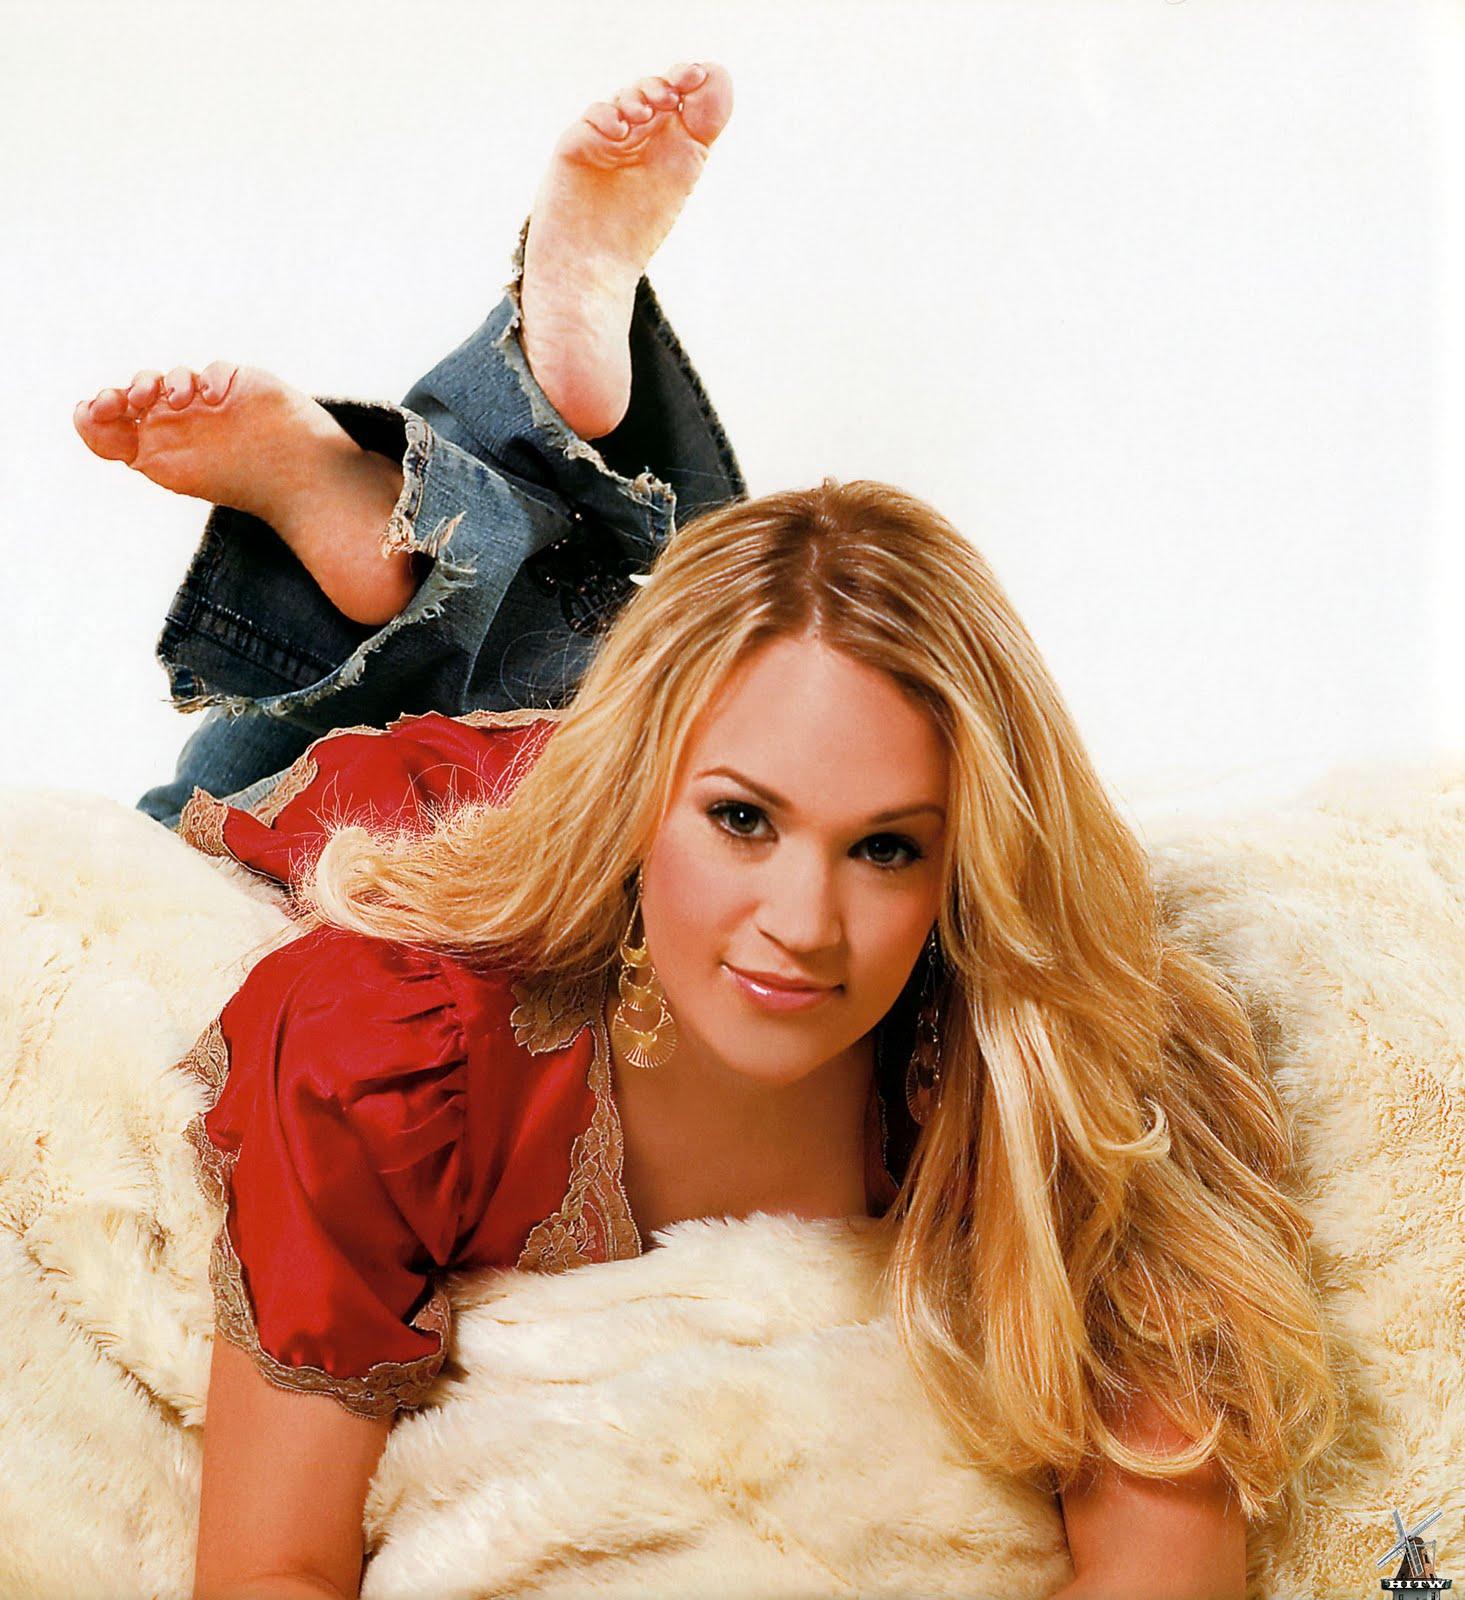 http://2.bp.blogspot.com/-YDws9yf-pZo/Tdl1Ekg6G9I/AAAAAAAAAxQ/LrHlq93xgxw/s1600/Carrie-Underwood-Feet-155842.jpg